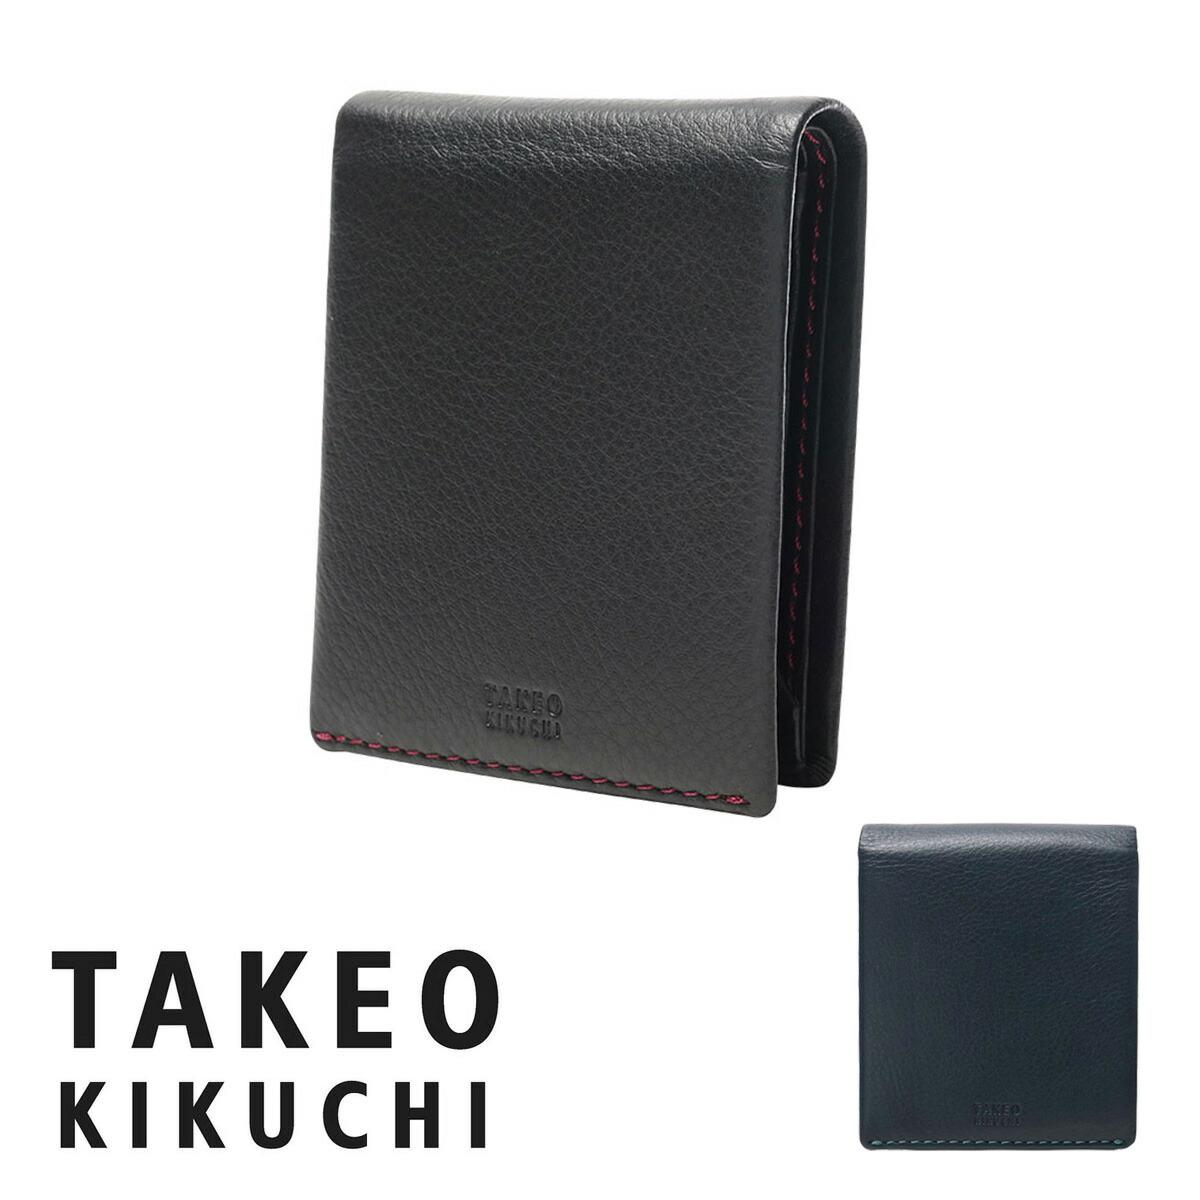 31a4d9eecf7a3e タケオキクチ 二つ折り財布 メンズ モルビド 9100118 TAKEO KIKUCHI 財布 メンズ 牛革 本革 レザー ブランド専用BOX付き  の通販   SAC'S BAR サックスバー